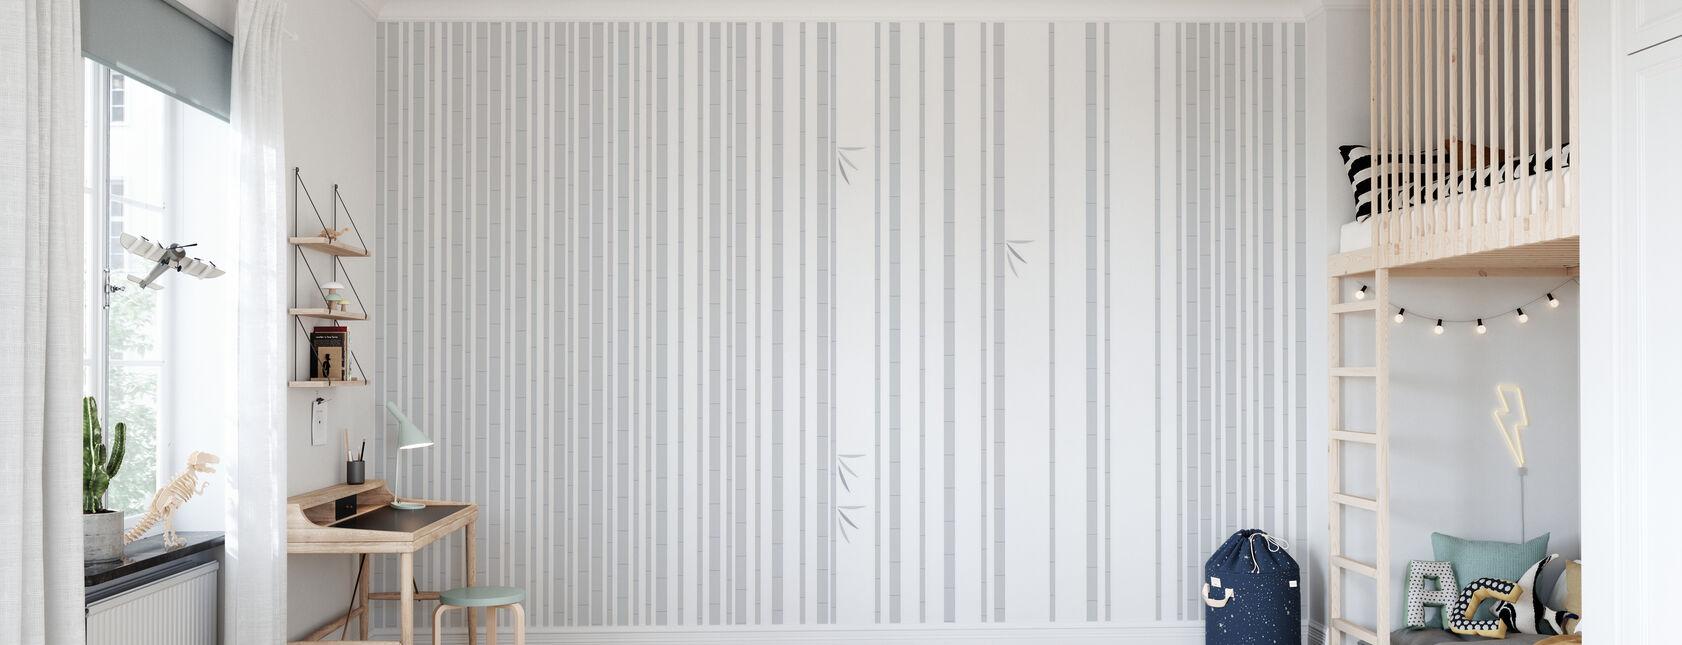 Bambu Forest Grey - Wallpaper - Kids Room